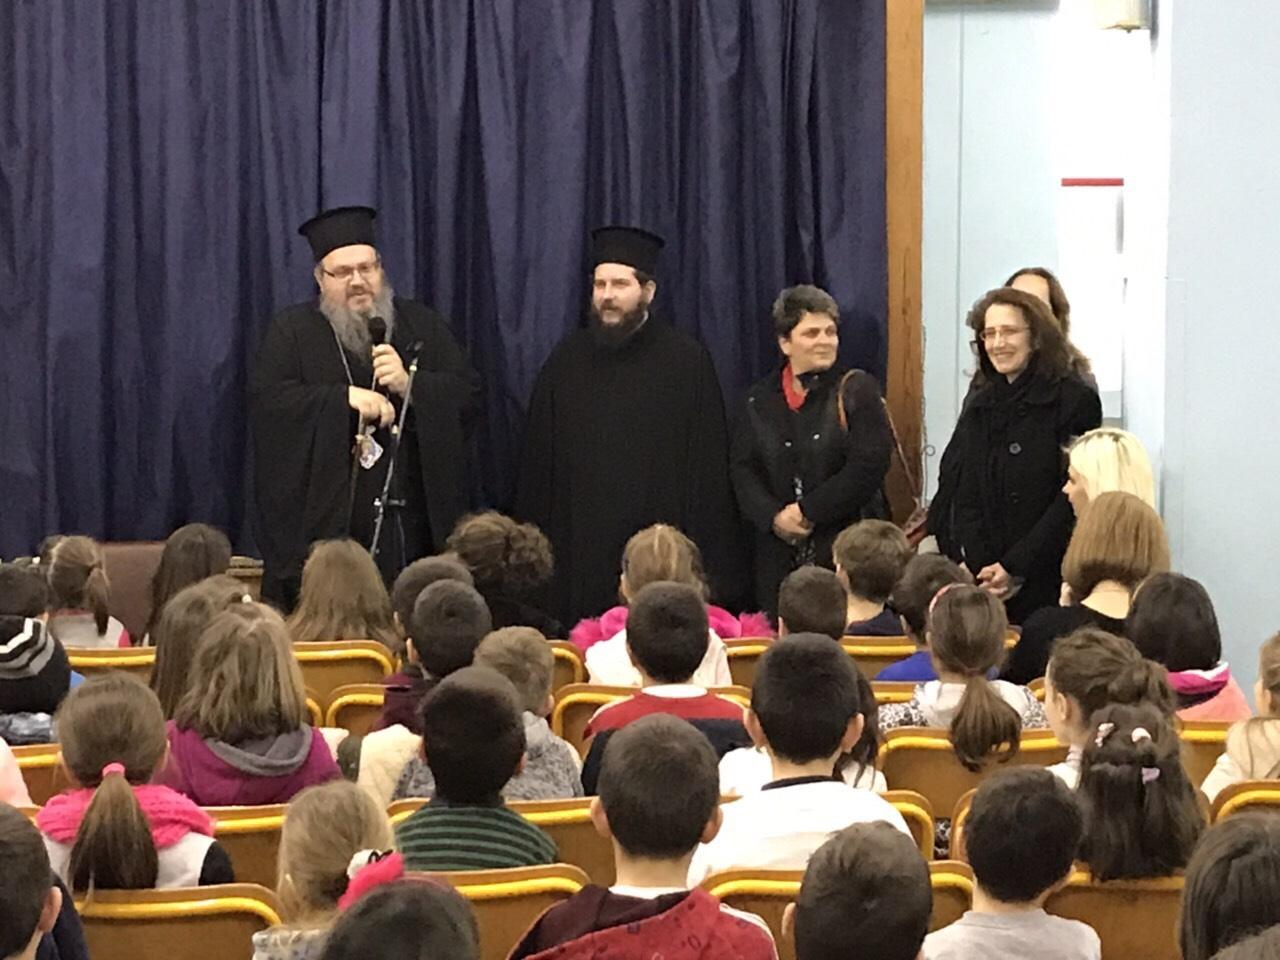 sxolia tirnavos 7 - Σε σχολεία του Τυρνάβου ο Σεβασμιώτατος (φωτ.)